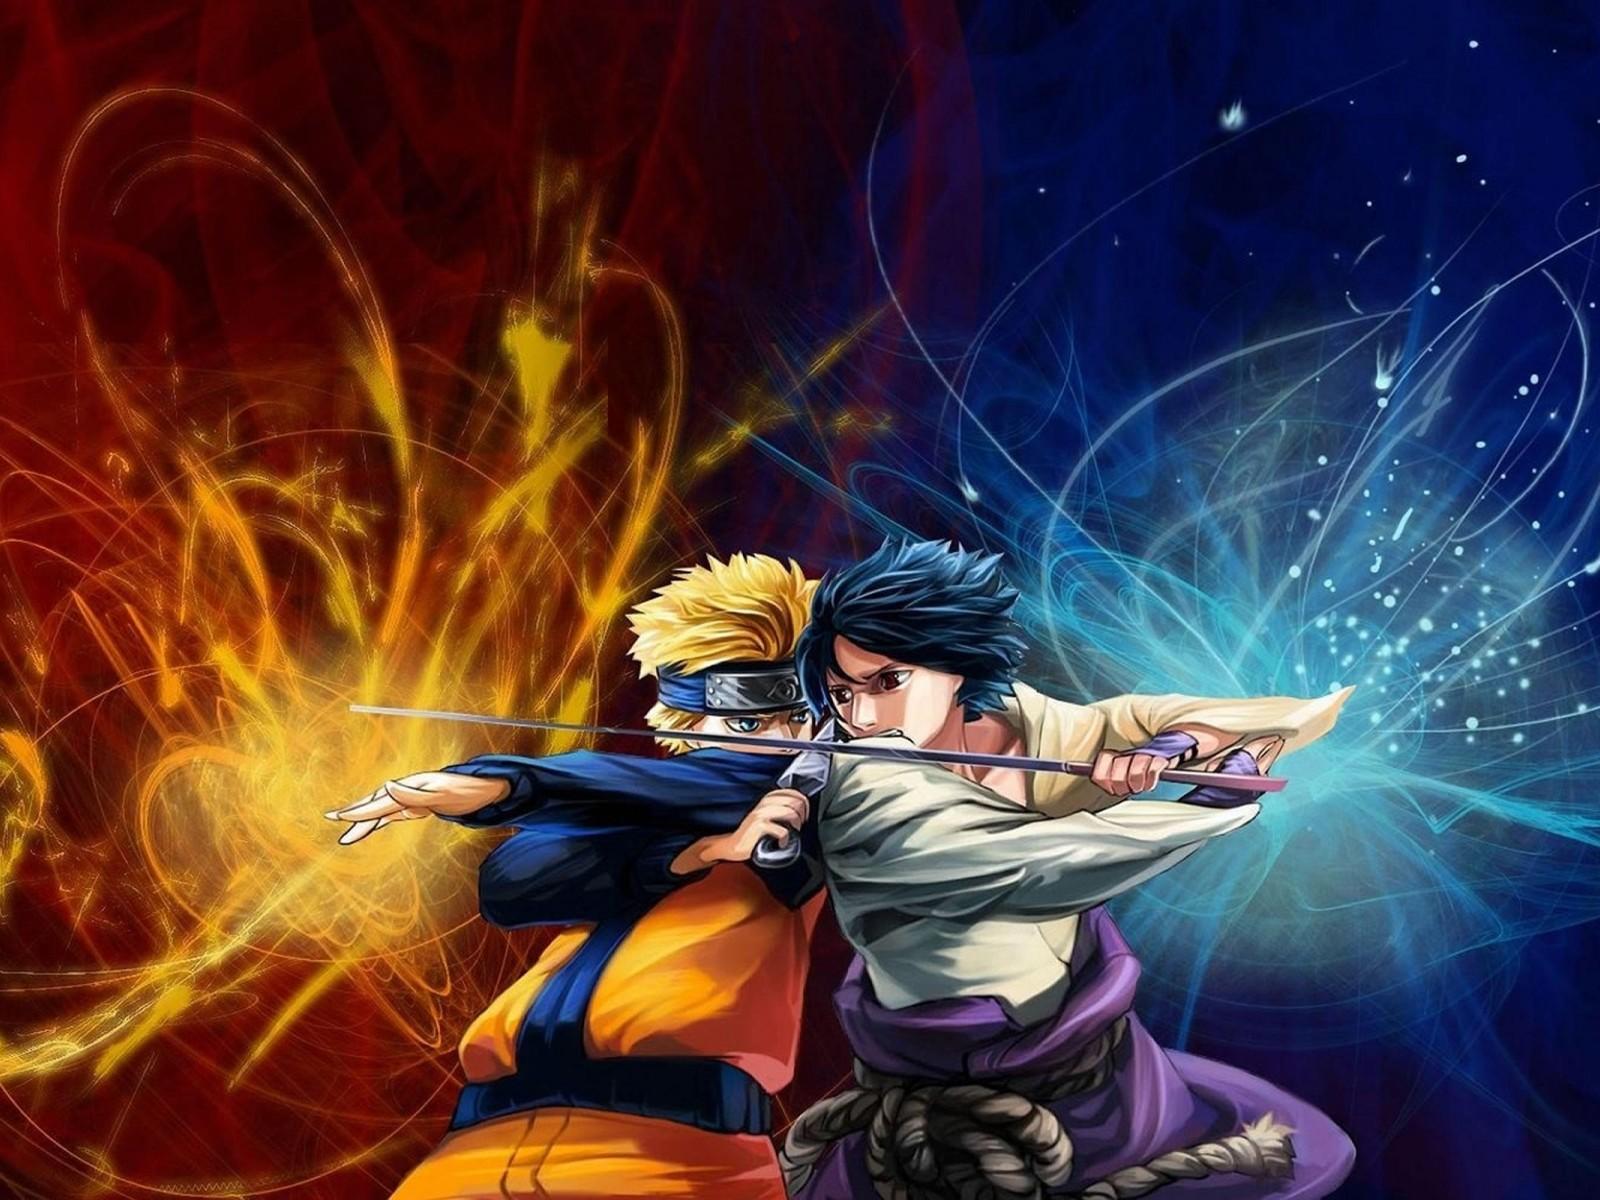 imagens para celular naruto shippuden - Imagens do Naruto Shippuden para papel de parede